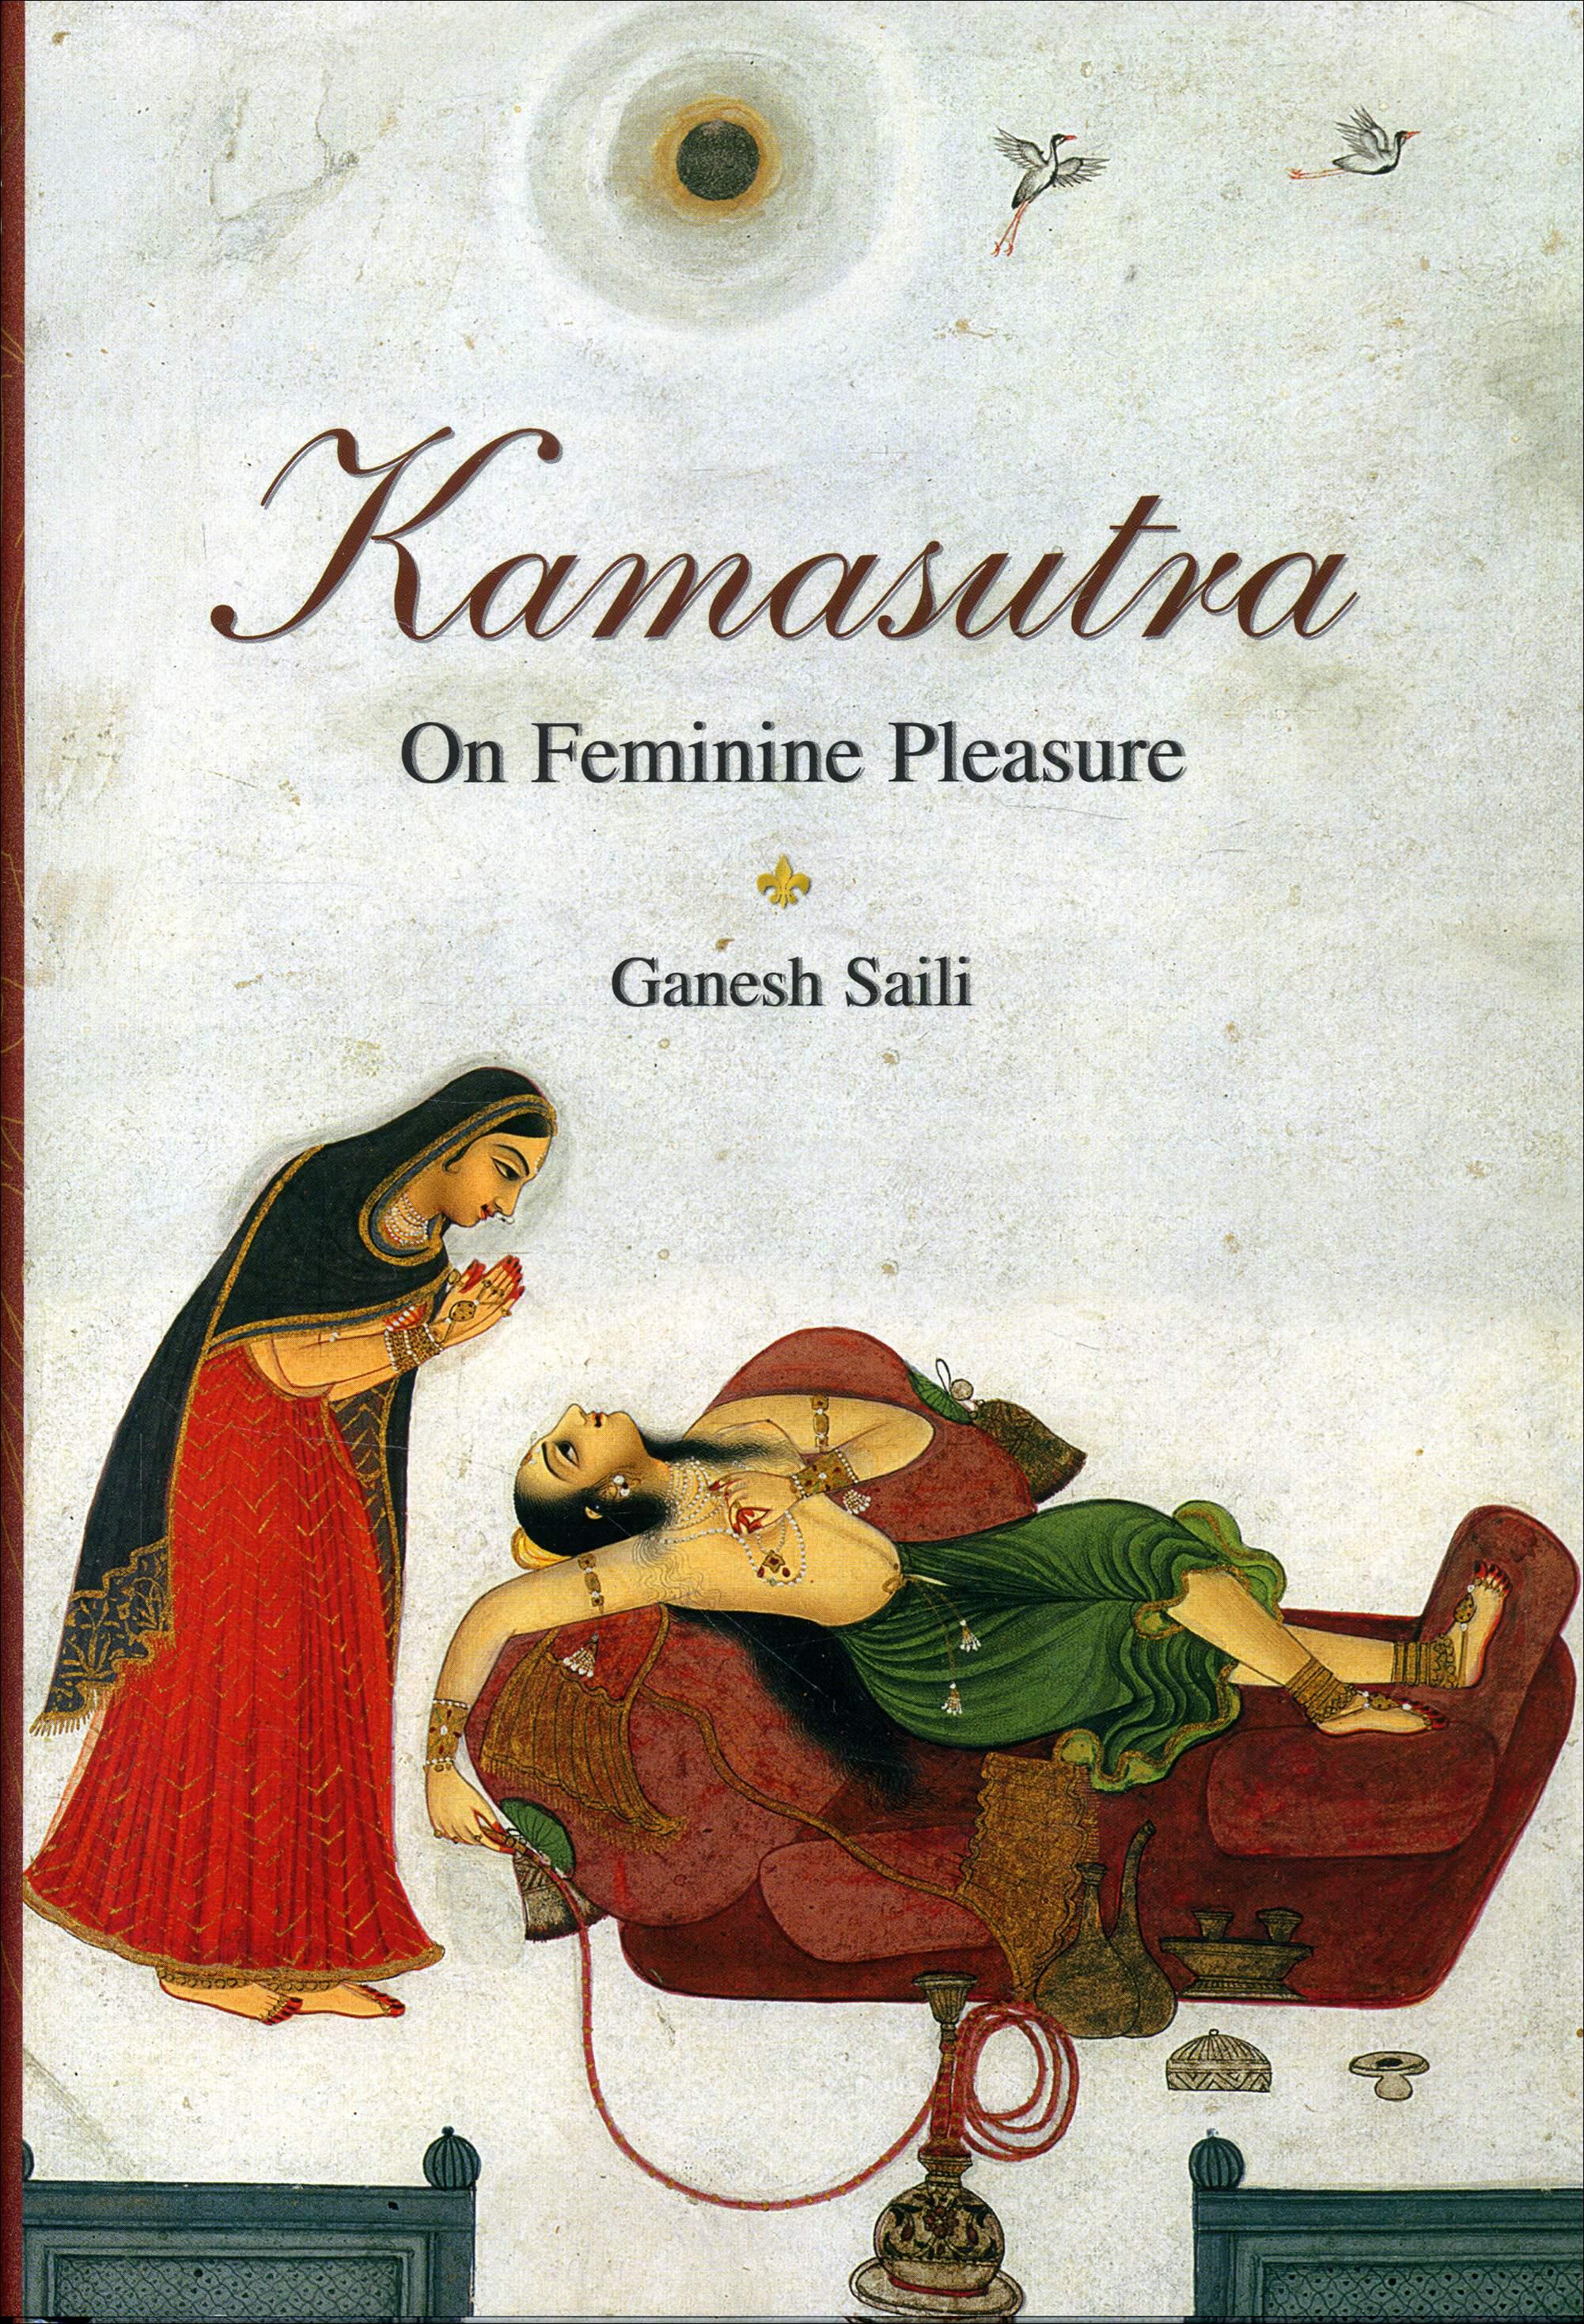 Kama Sutra on Feminine Pleasure - Ganesh Saili NEW book   eBay